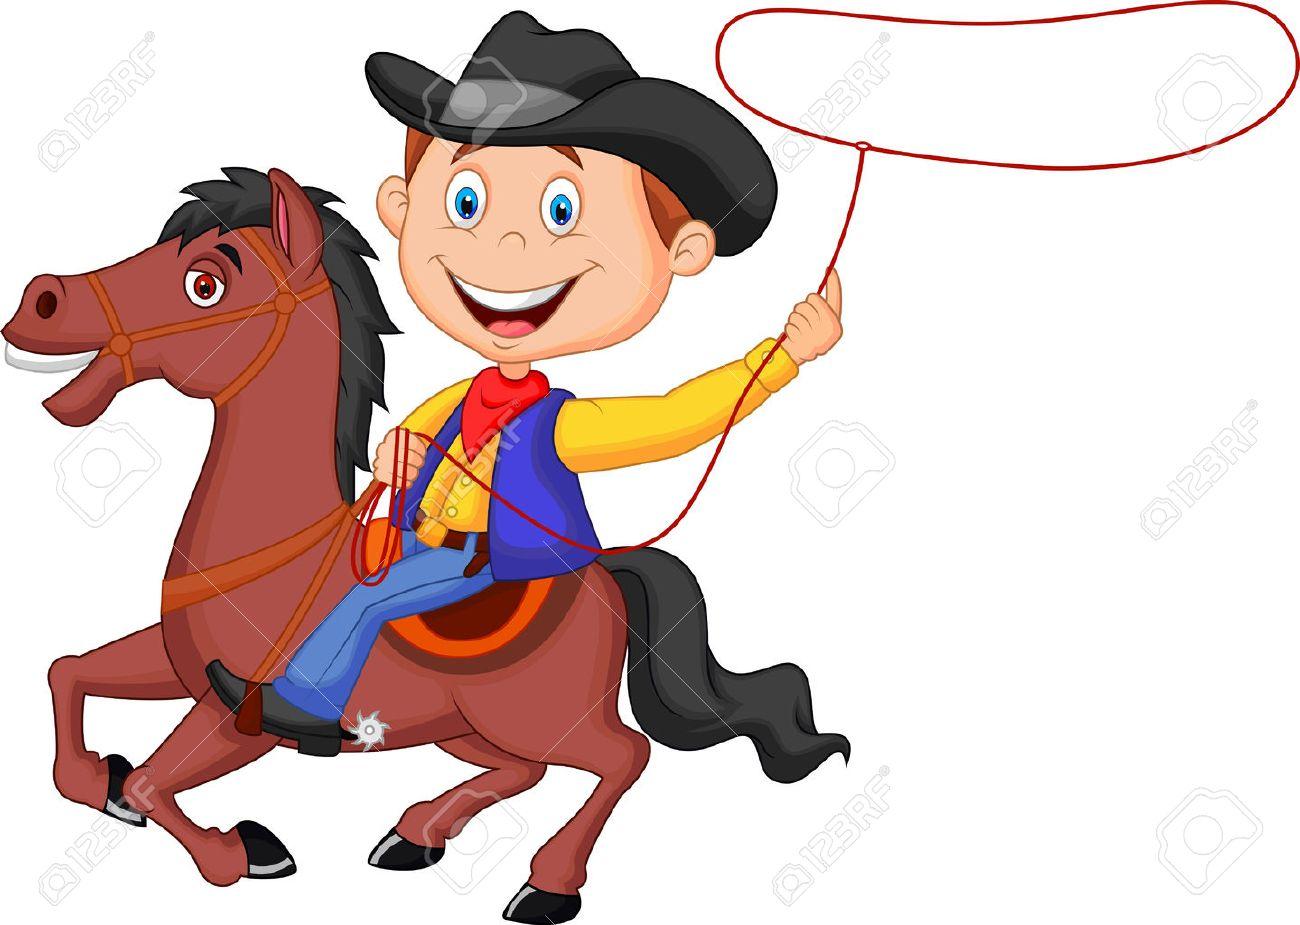 Cartoon Cowboy rider on the horse throwing lasso.